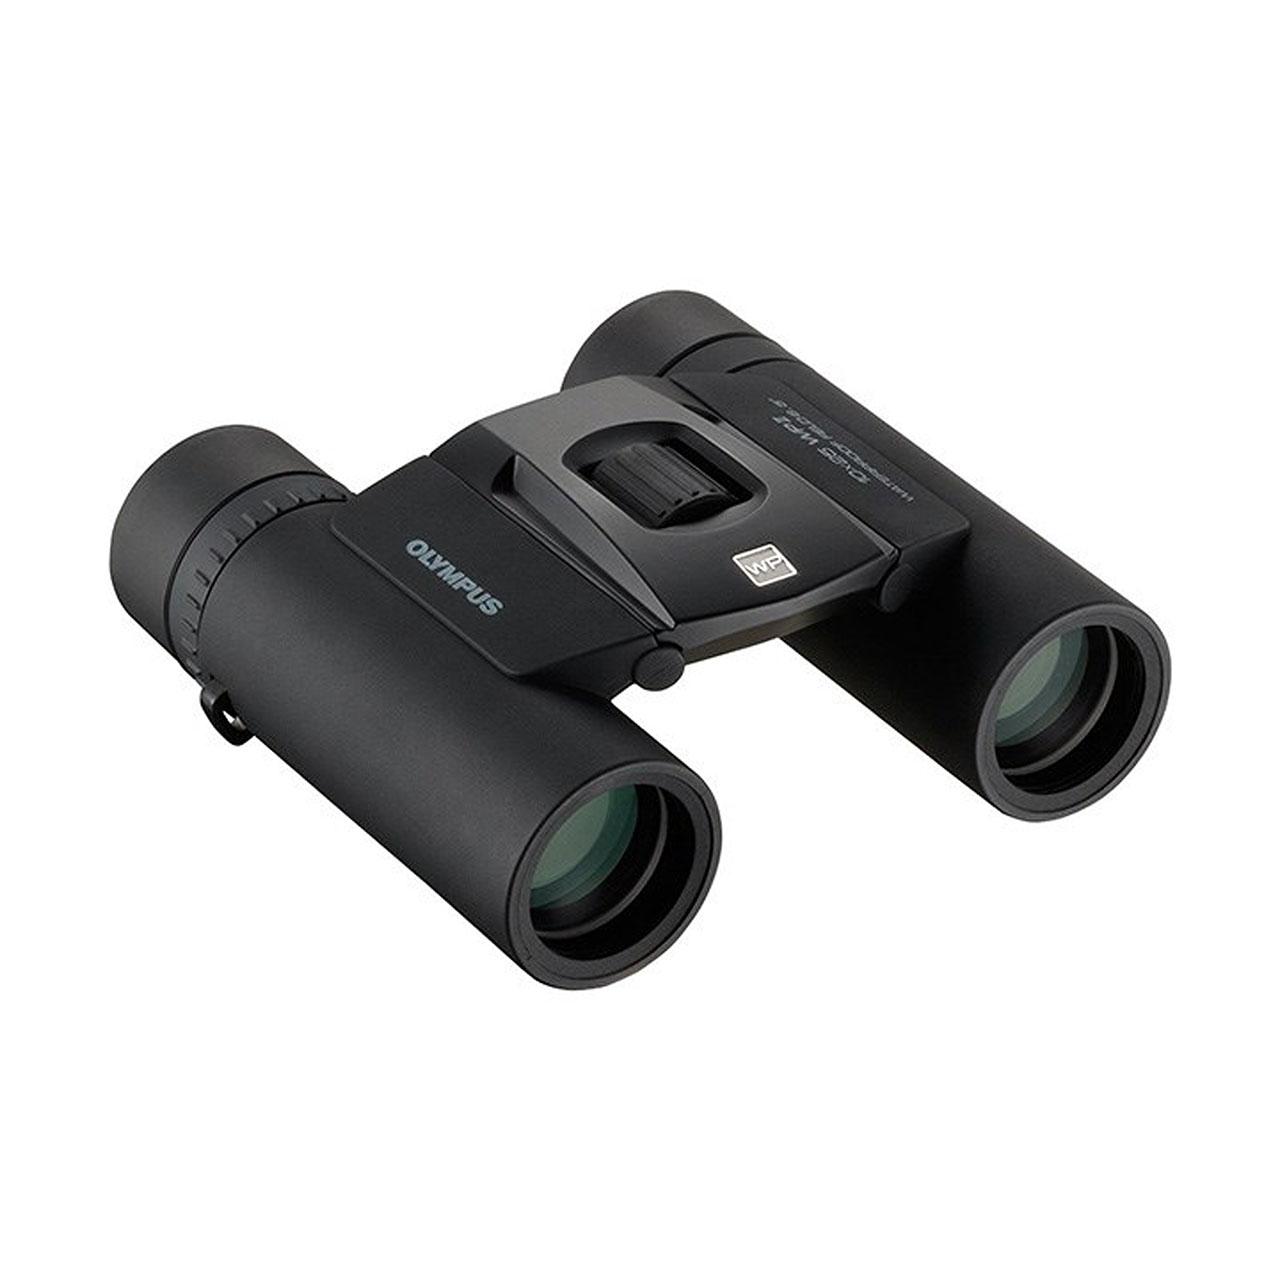 دوربین دو چشمی الیمپوس مدل 10X25 WP II